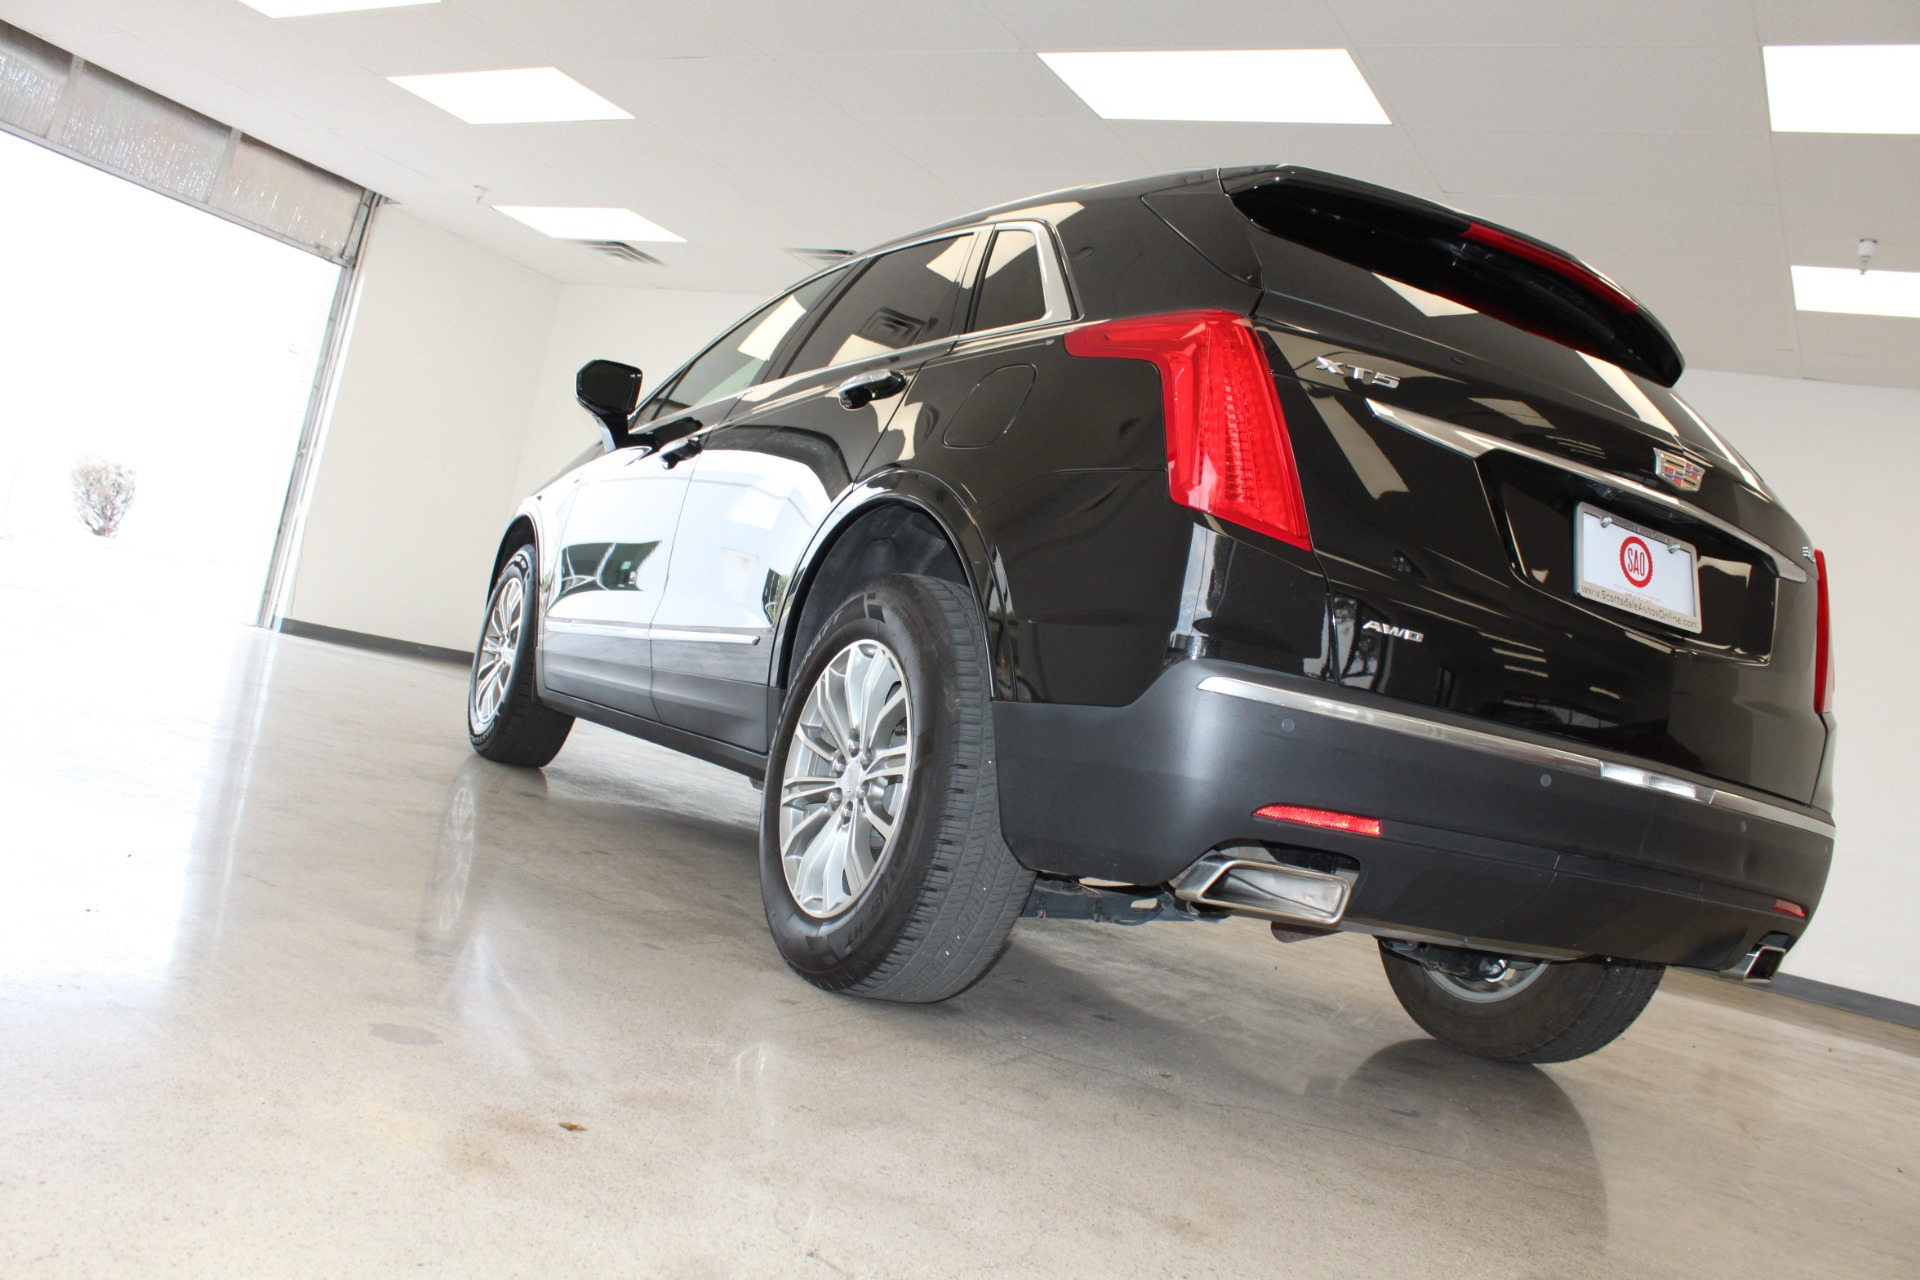 Used-2017-Cadillac-XT5-Luxury-All-Wheel-Drive-Luxury-AWD-Ford